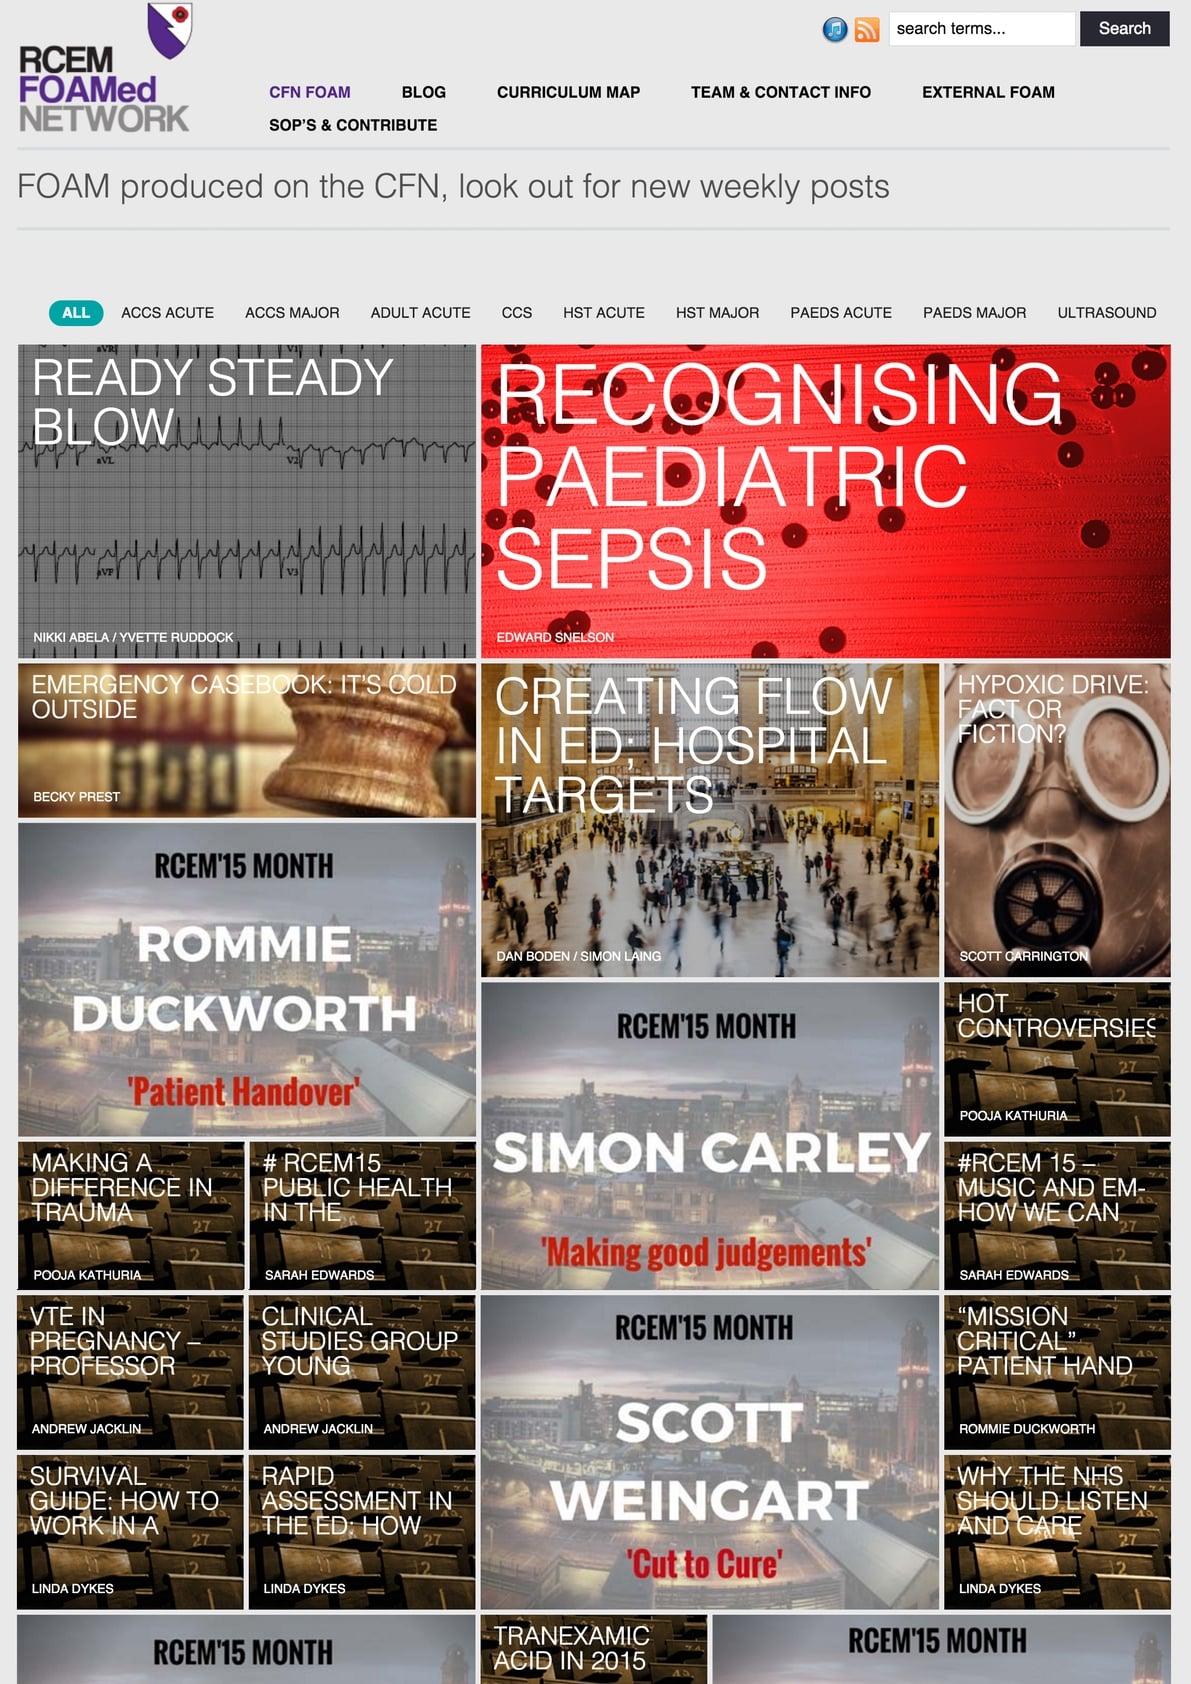 http://www.rcemfoamed.co.uk/portfolio/paediatric-analgesia-in-the-ed/